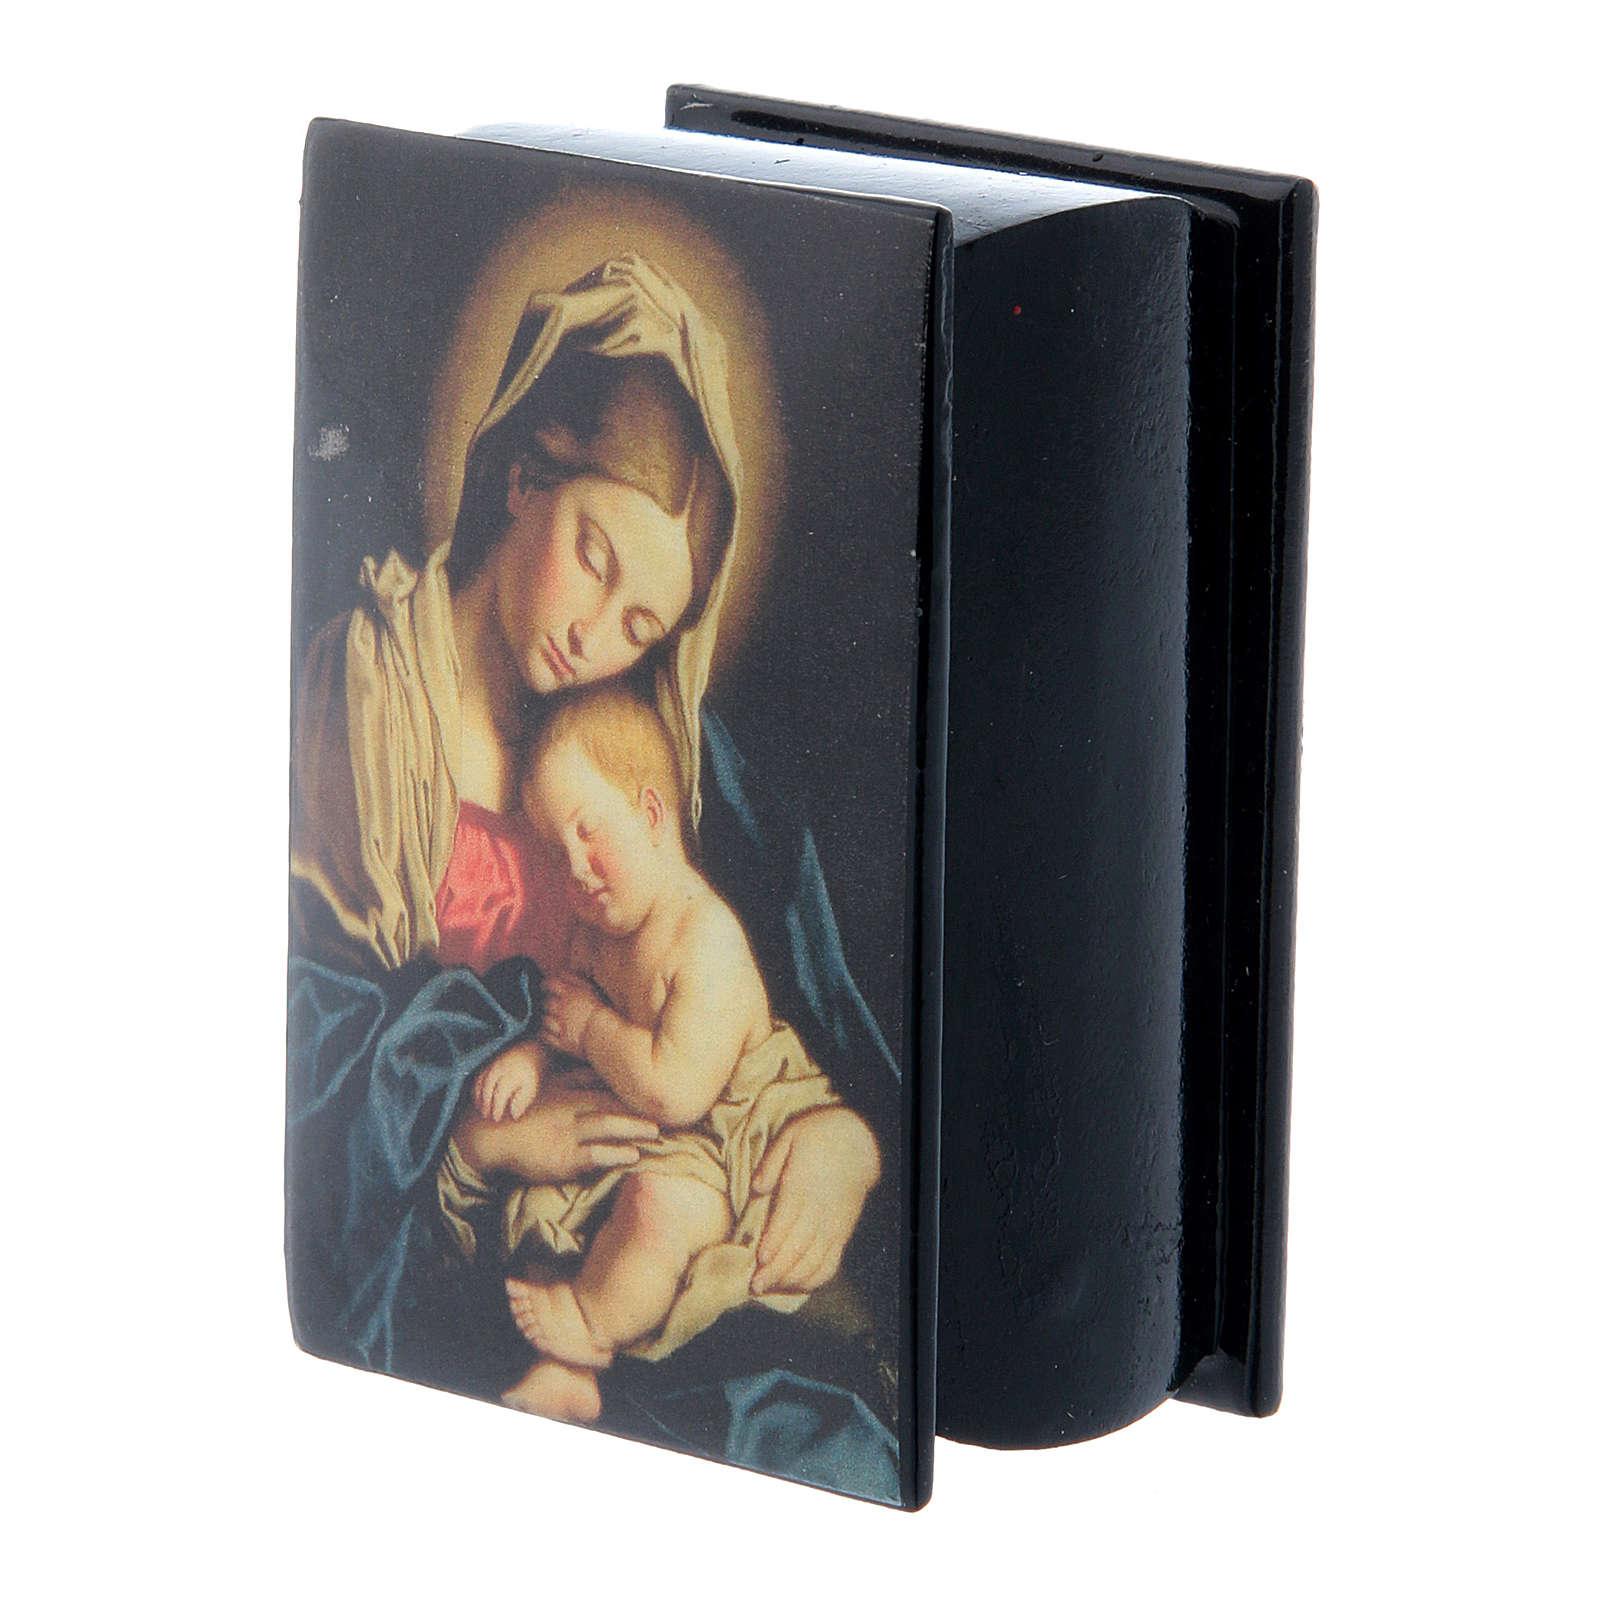 Russian papier-mâché and lacquer box Madonna with Child 7x5 cm 4